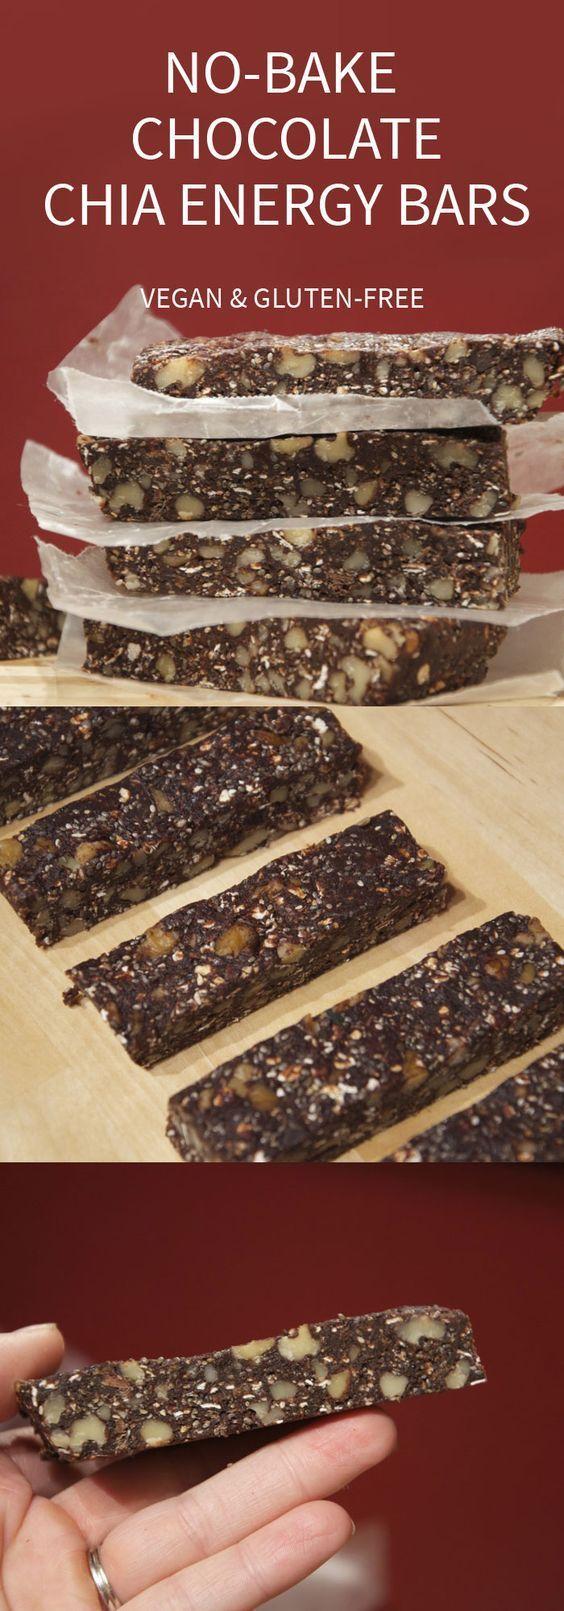 No-Bake Chocolate Chia Bars with Walnuts - Vegan and Gluten-Free: